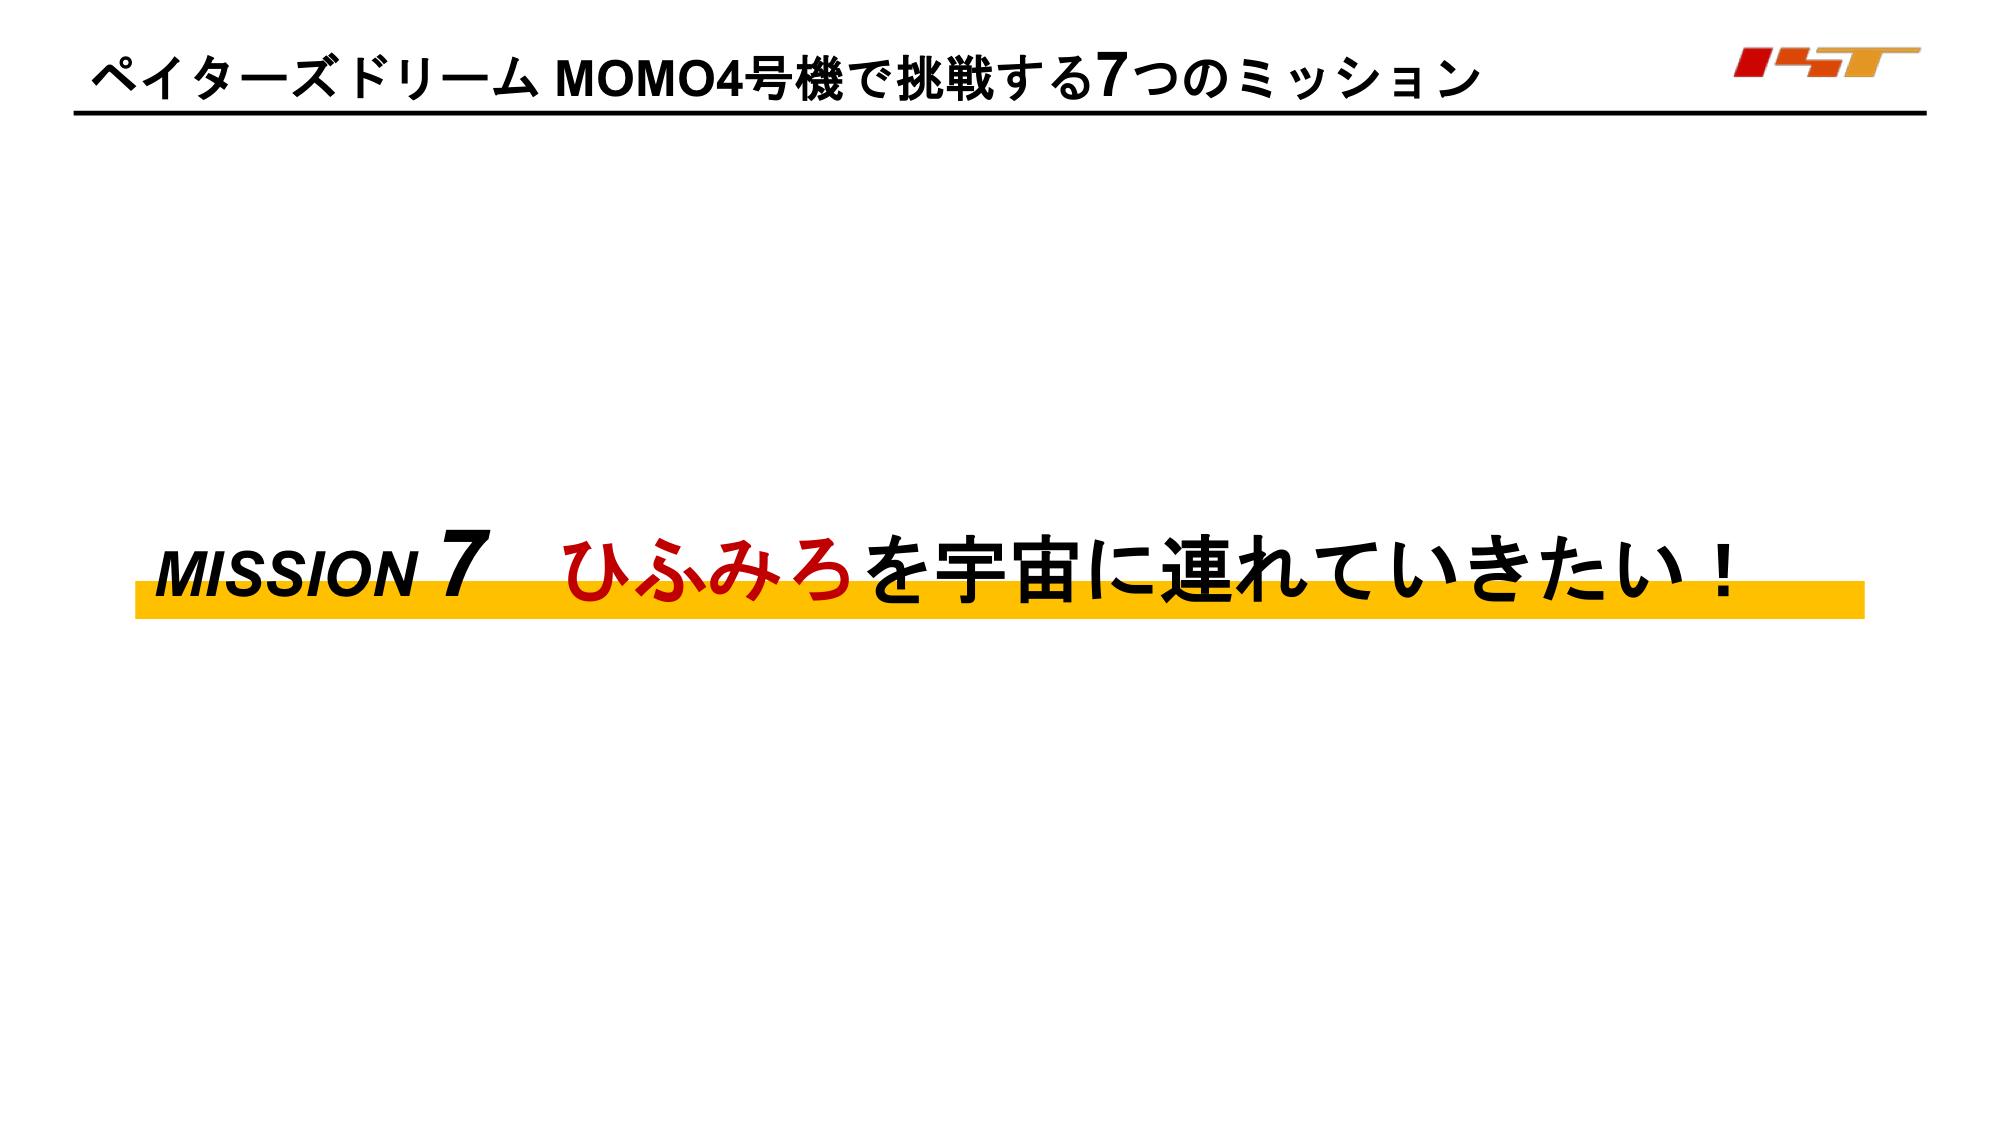 f:id:Imamura:20190628161351p:plain